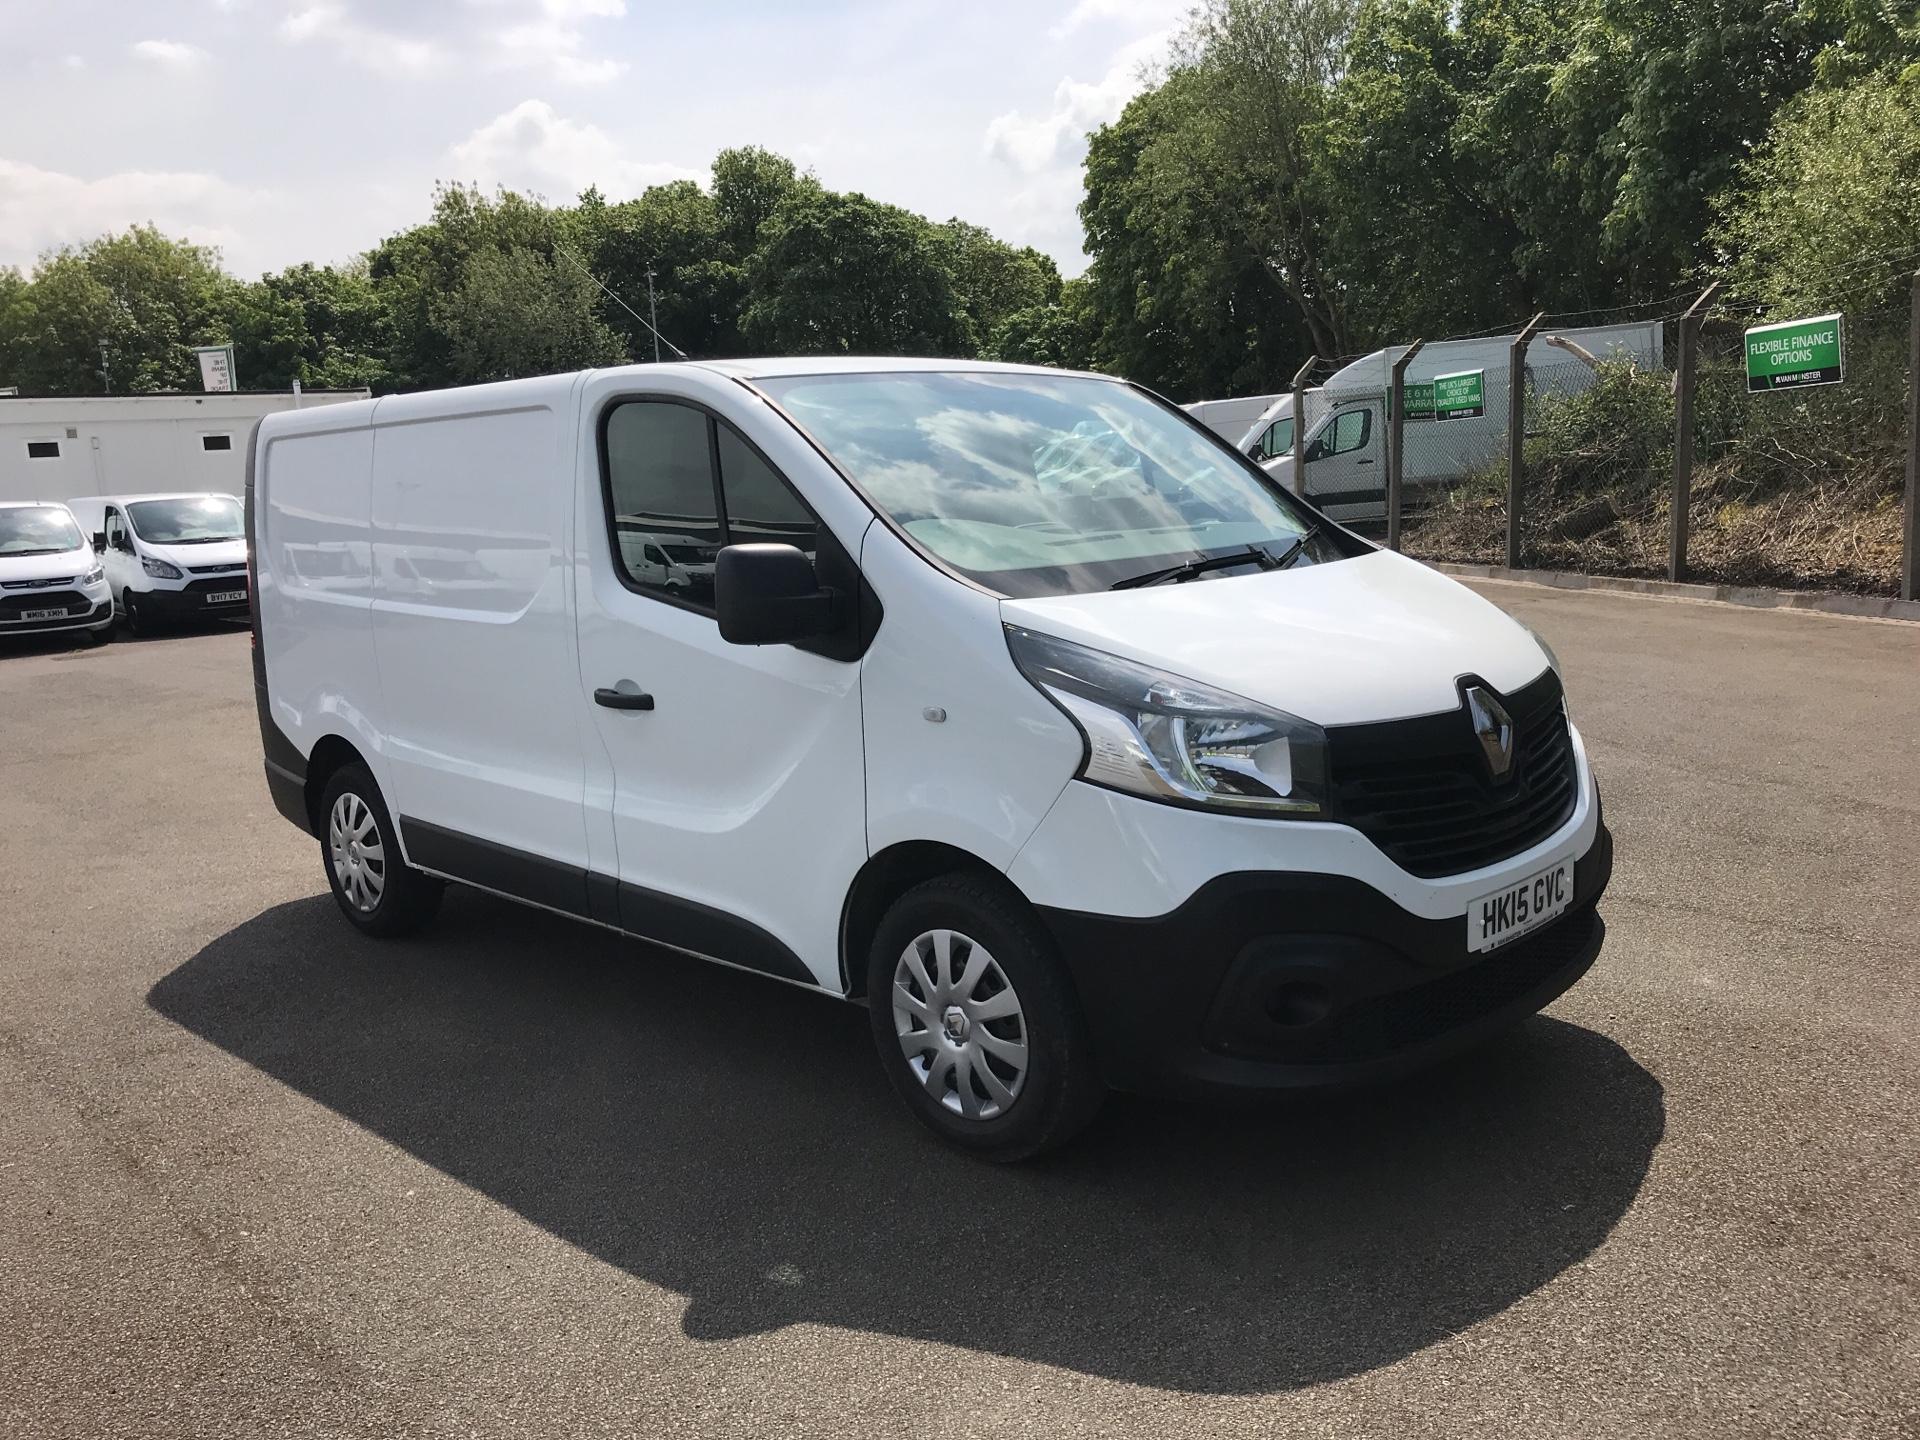 2015 Renault Trafic Sl29dci 115 Business Van (HK15GVC)